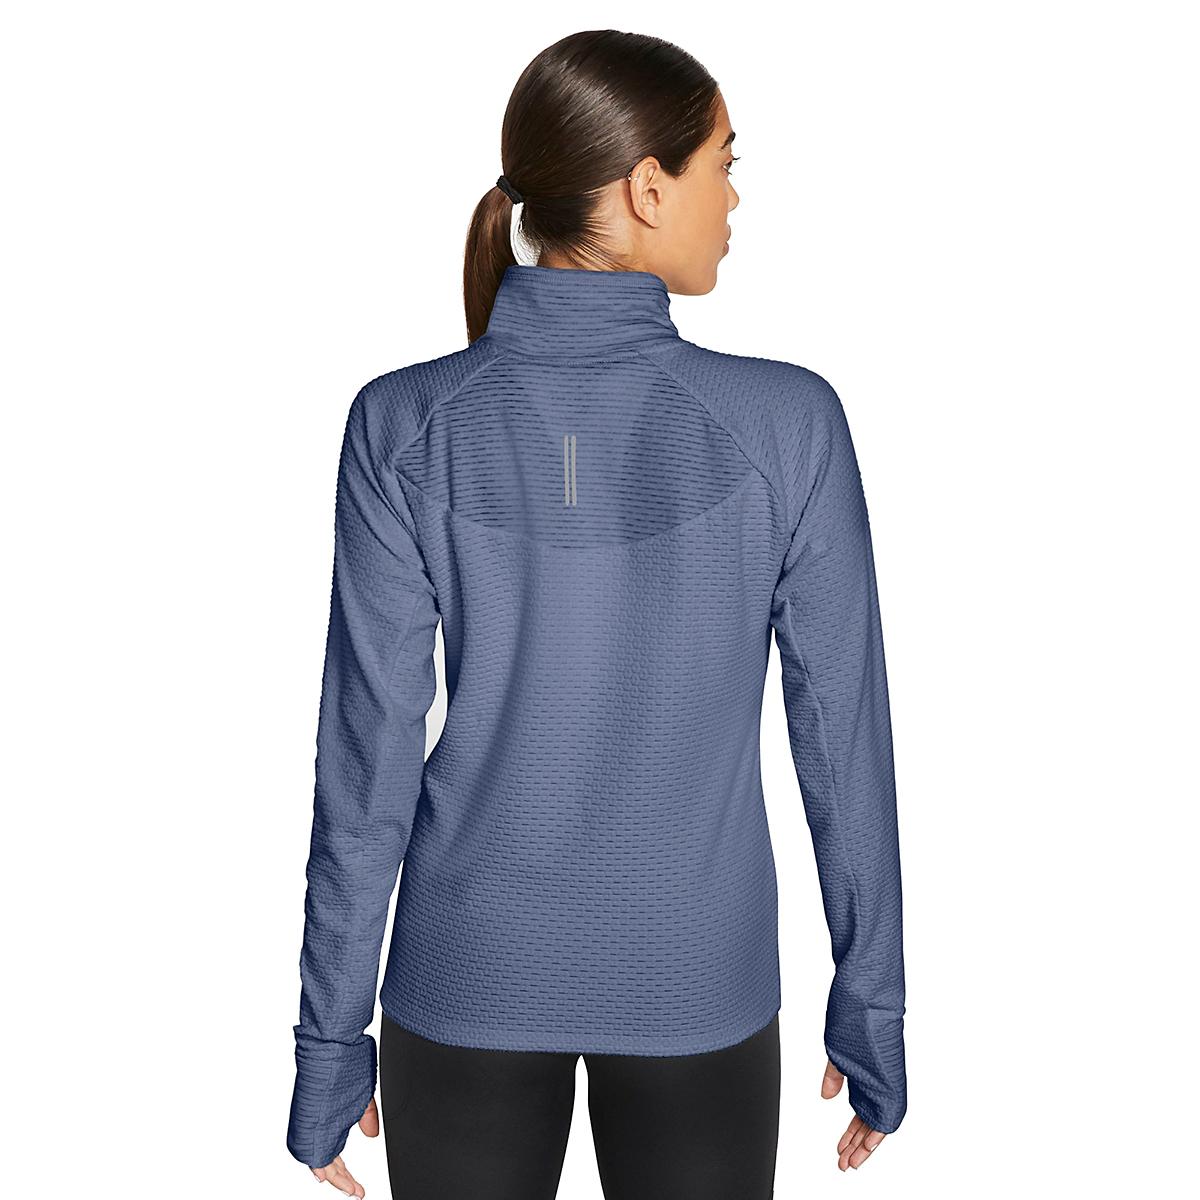 Women's Nike Sphere Half Zip Long Sleeve Shirt - Color: World Indigo/Reflective Silver - Size: XS, World Indigo/Reflective Silver, large, image 4